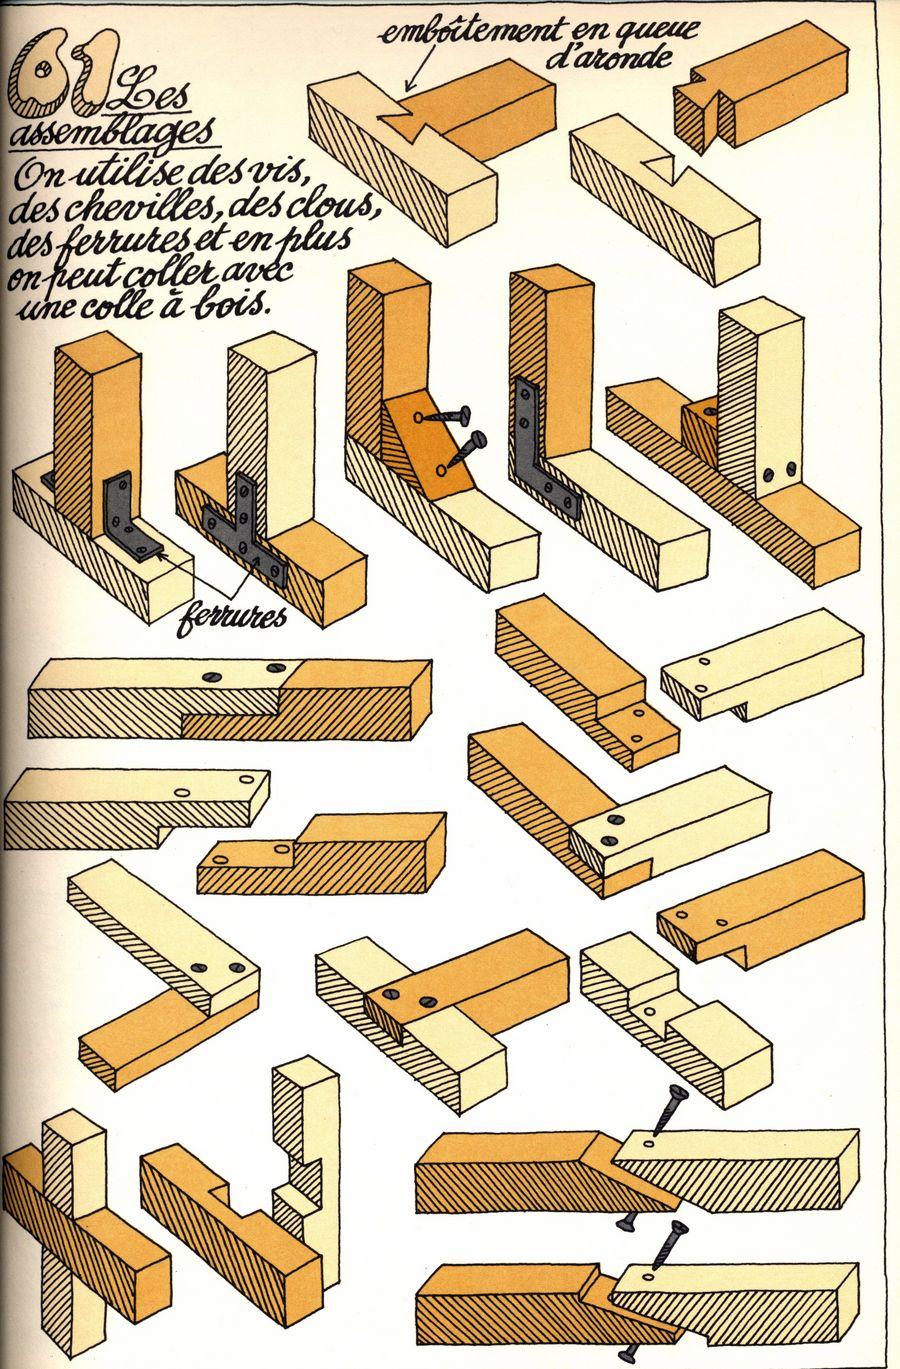 savoir revivre 61 les assemblages. Black Bedroom Furniture Sets. Home Design Ideas